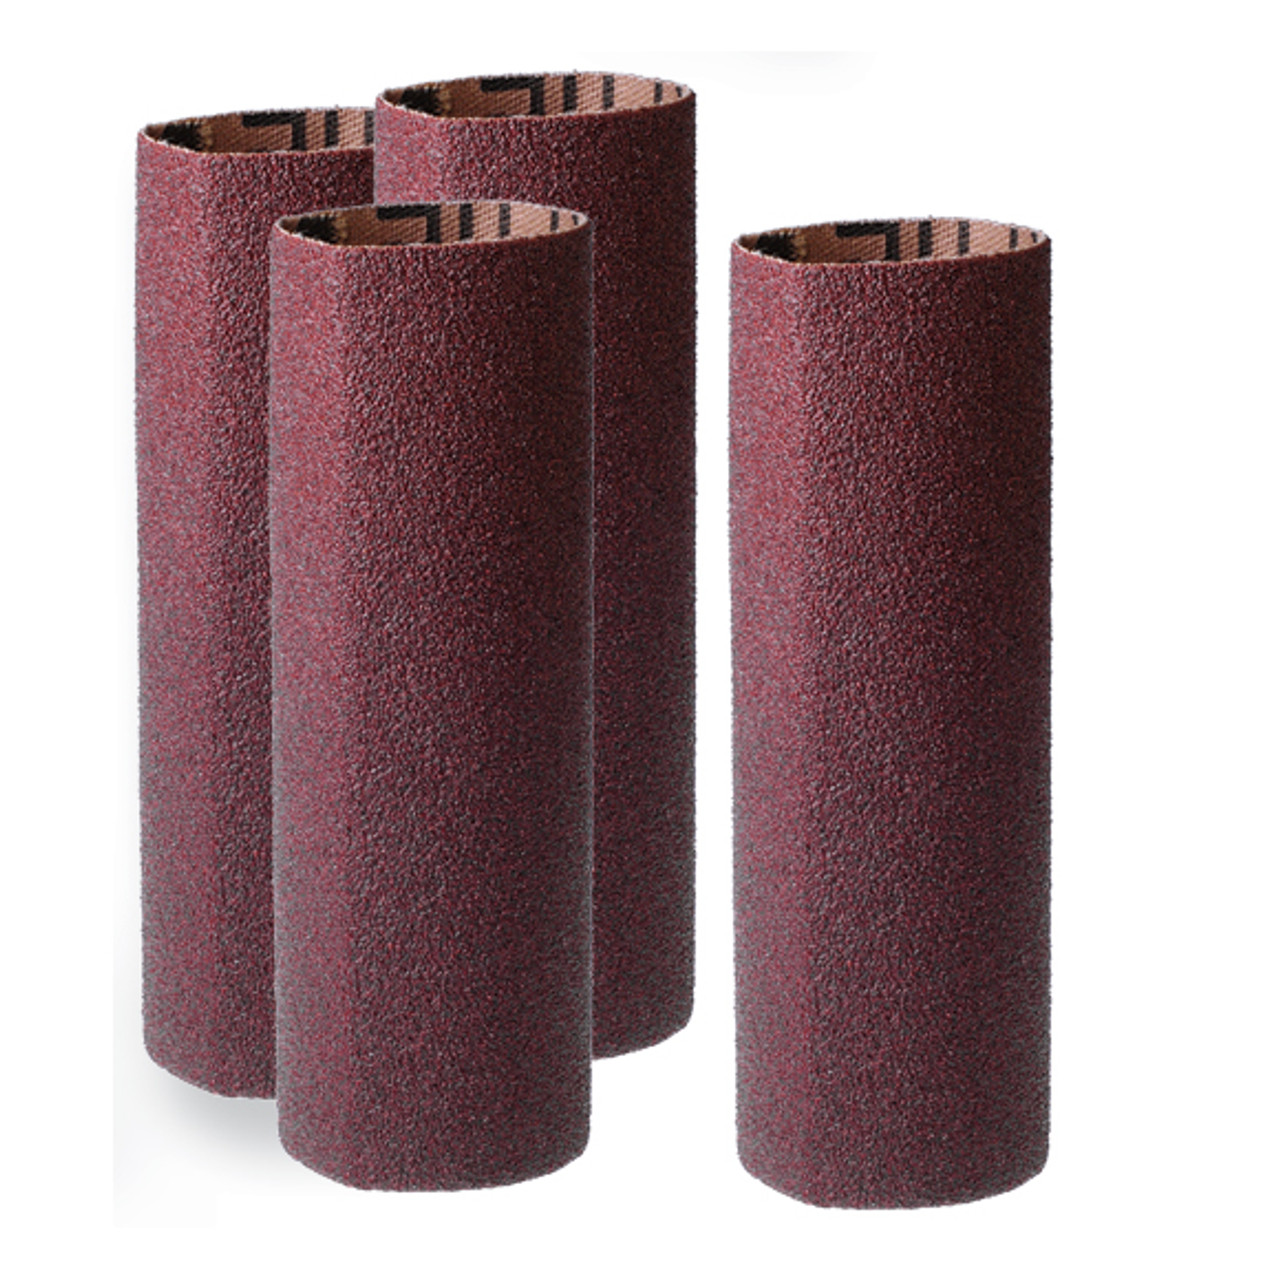 King Arthur's Tools 11372 Guinevere Long Drum Sander Sleeves - Assorted 4 Pack